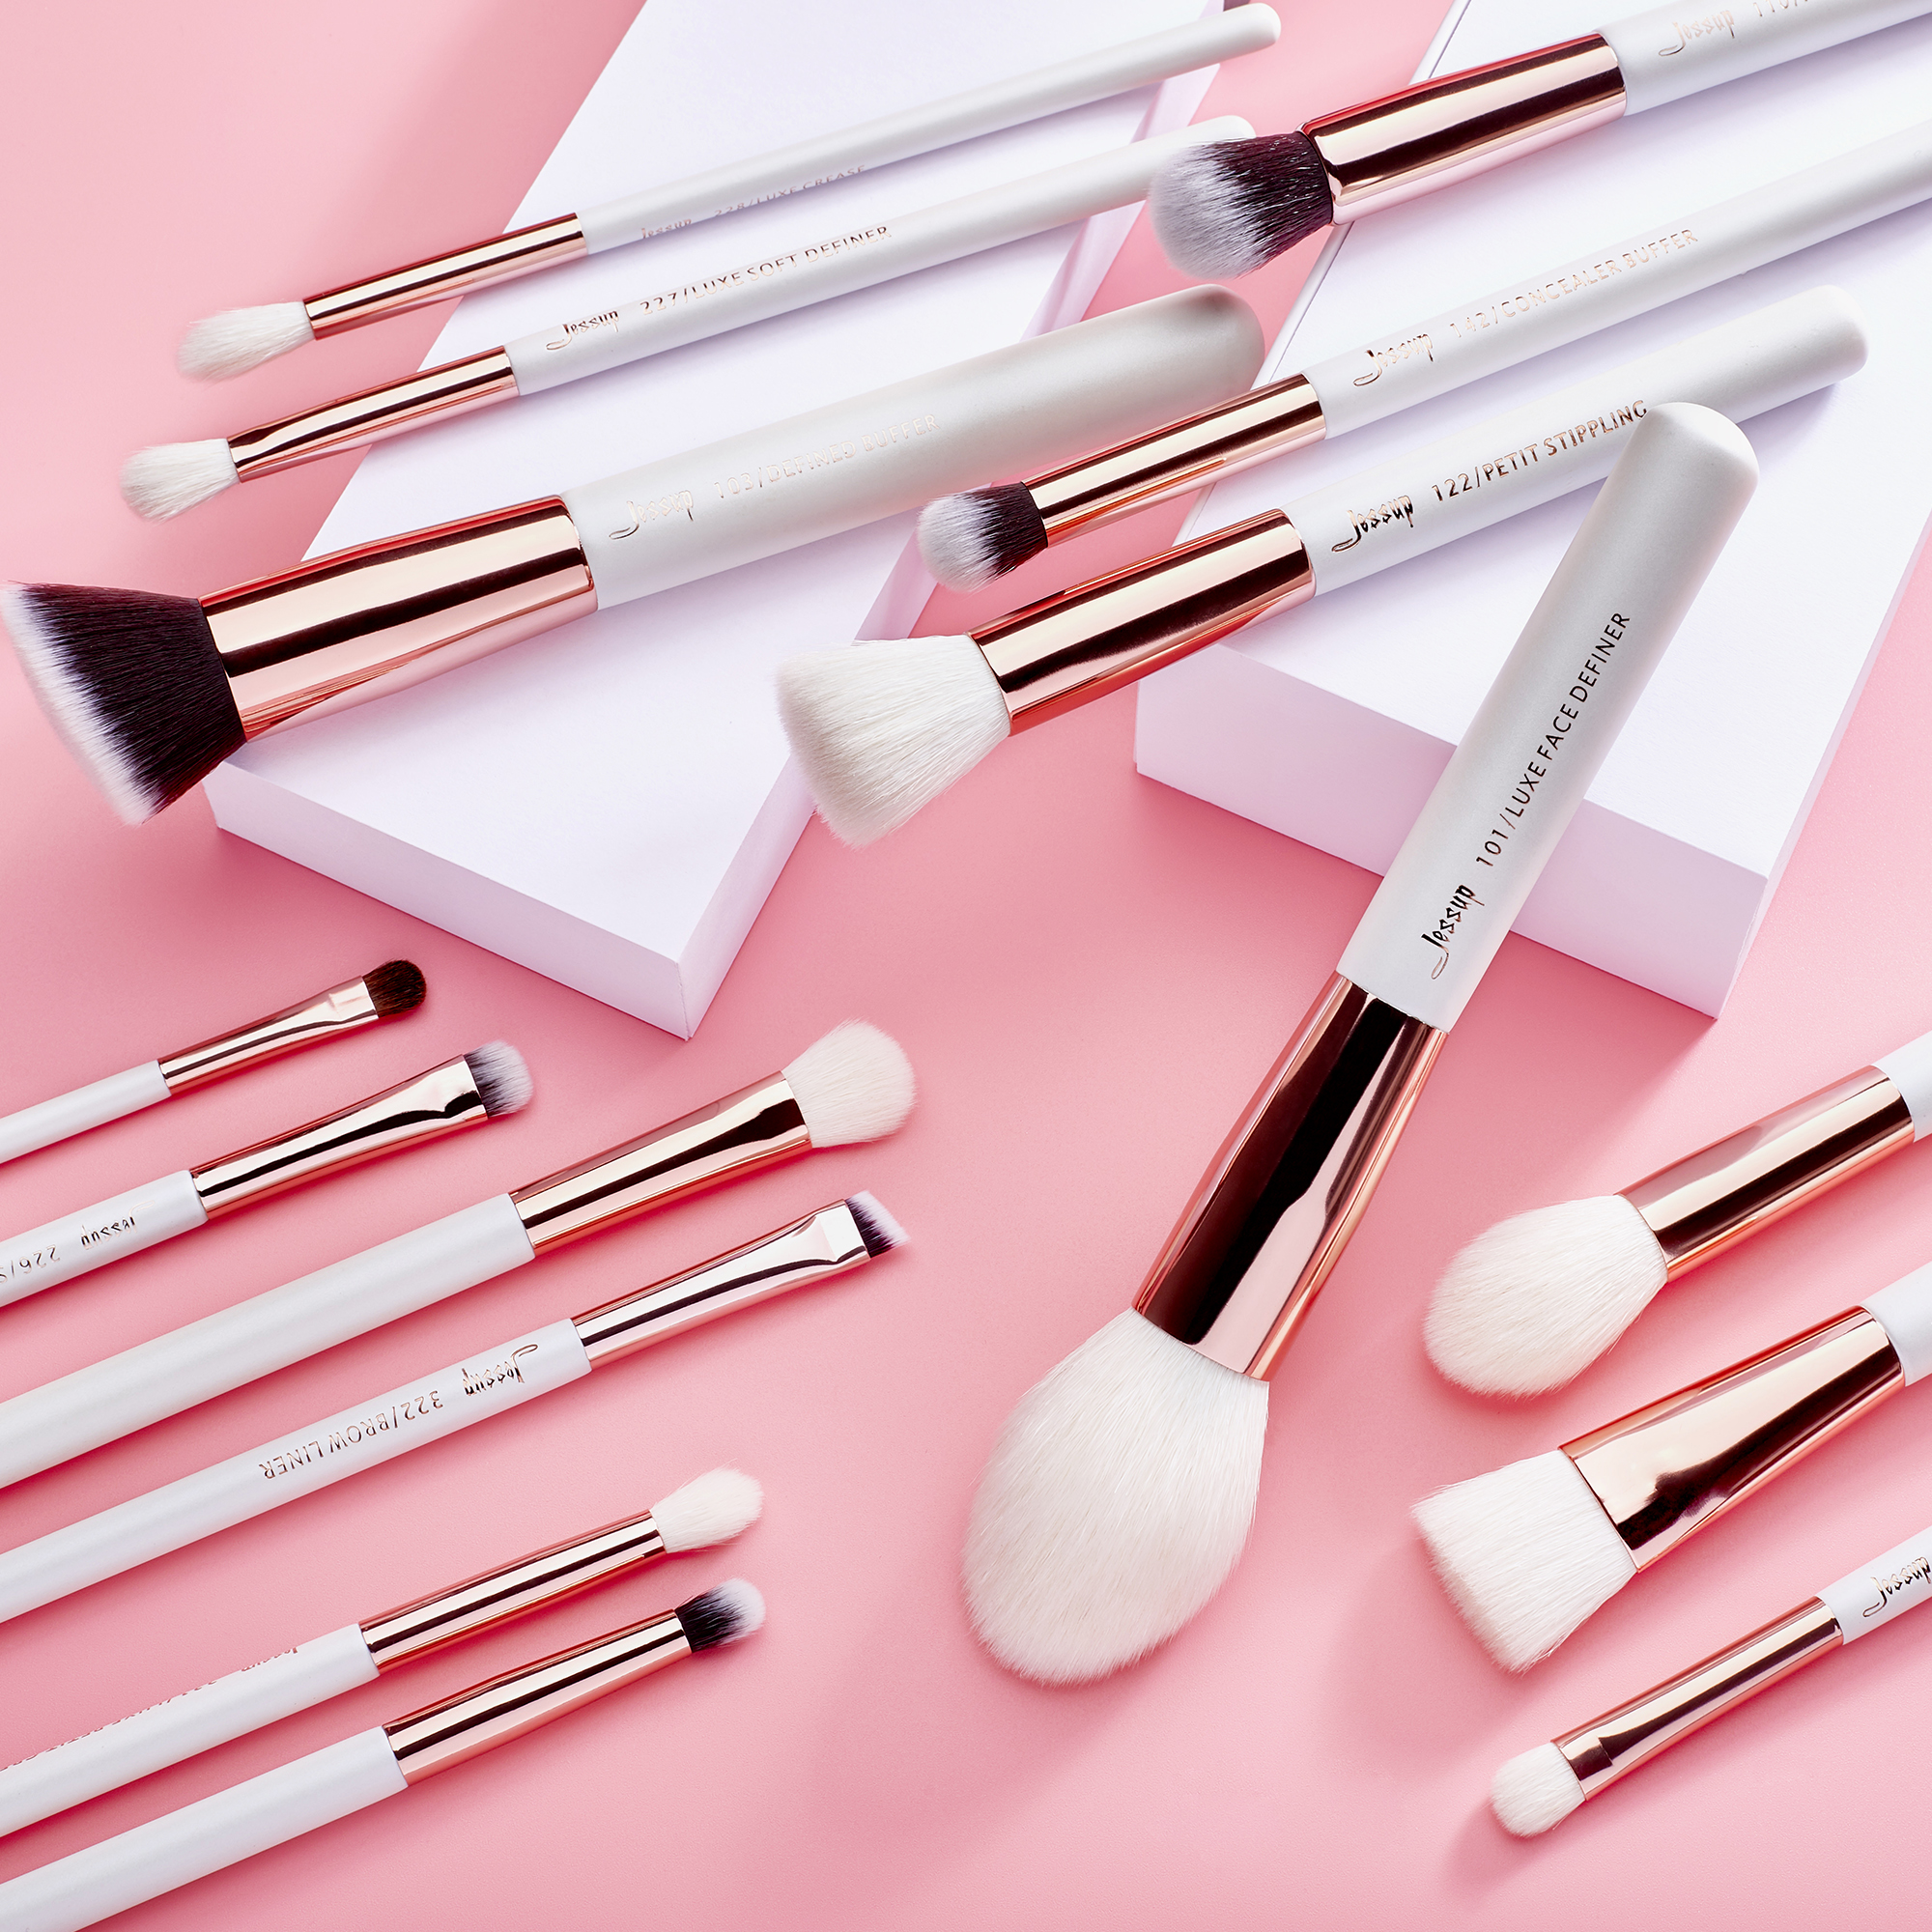 Jessup Makeup brushes set Pearl White / Rose Gold  2